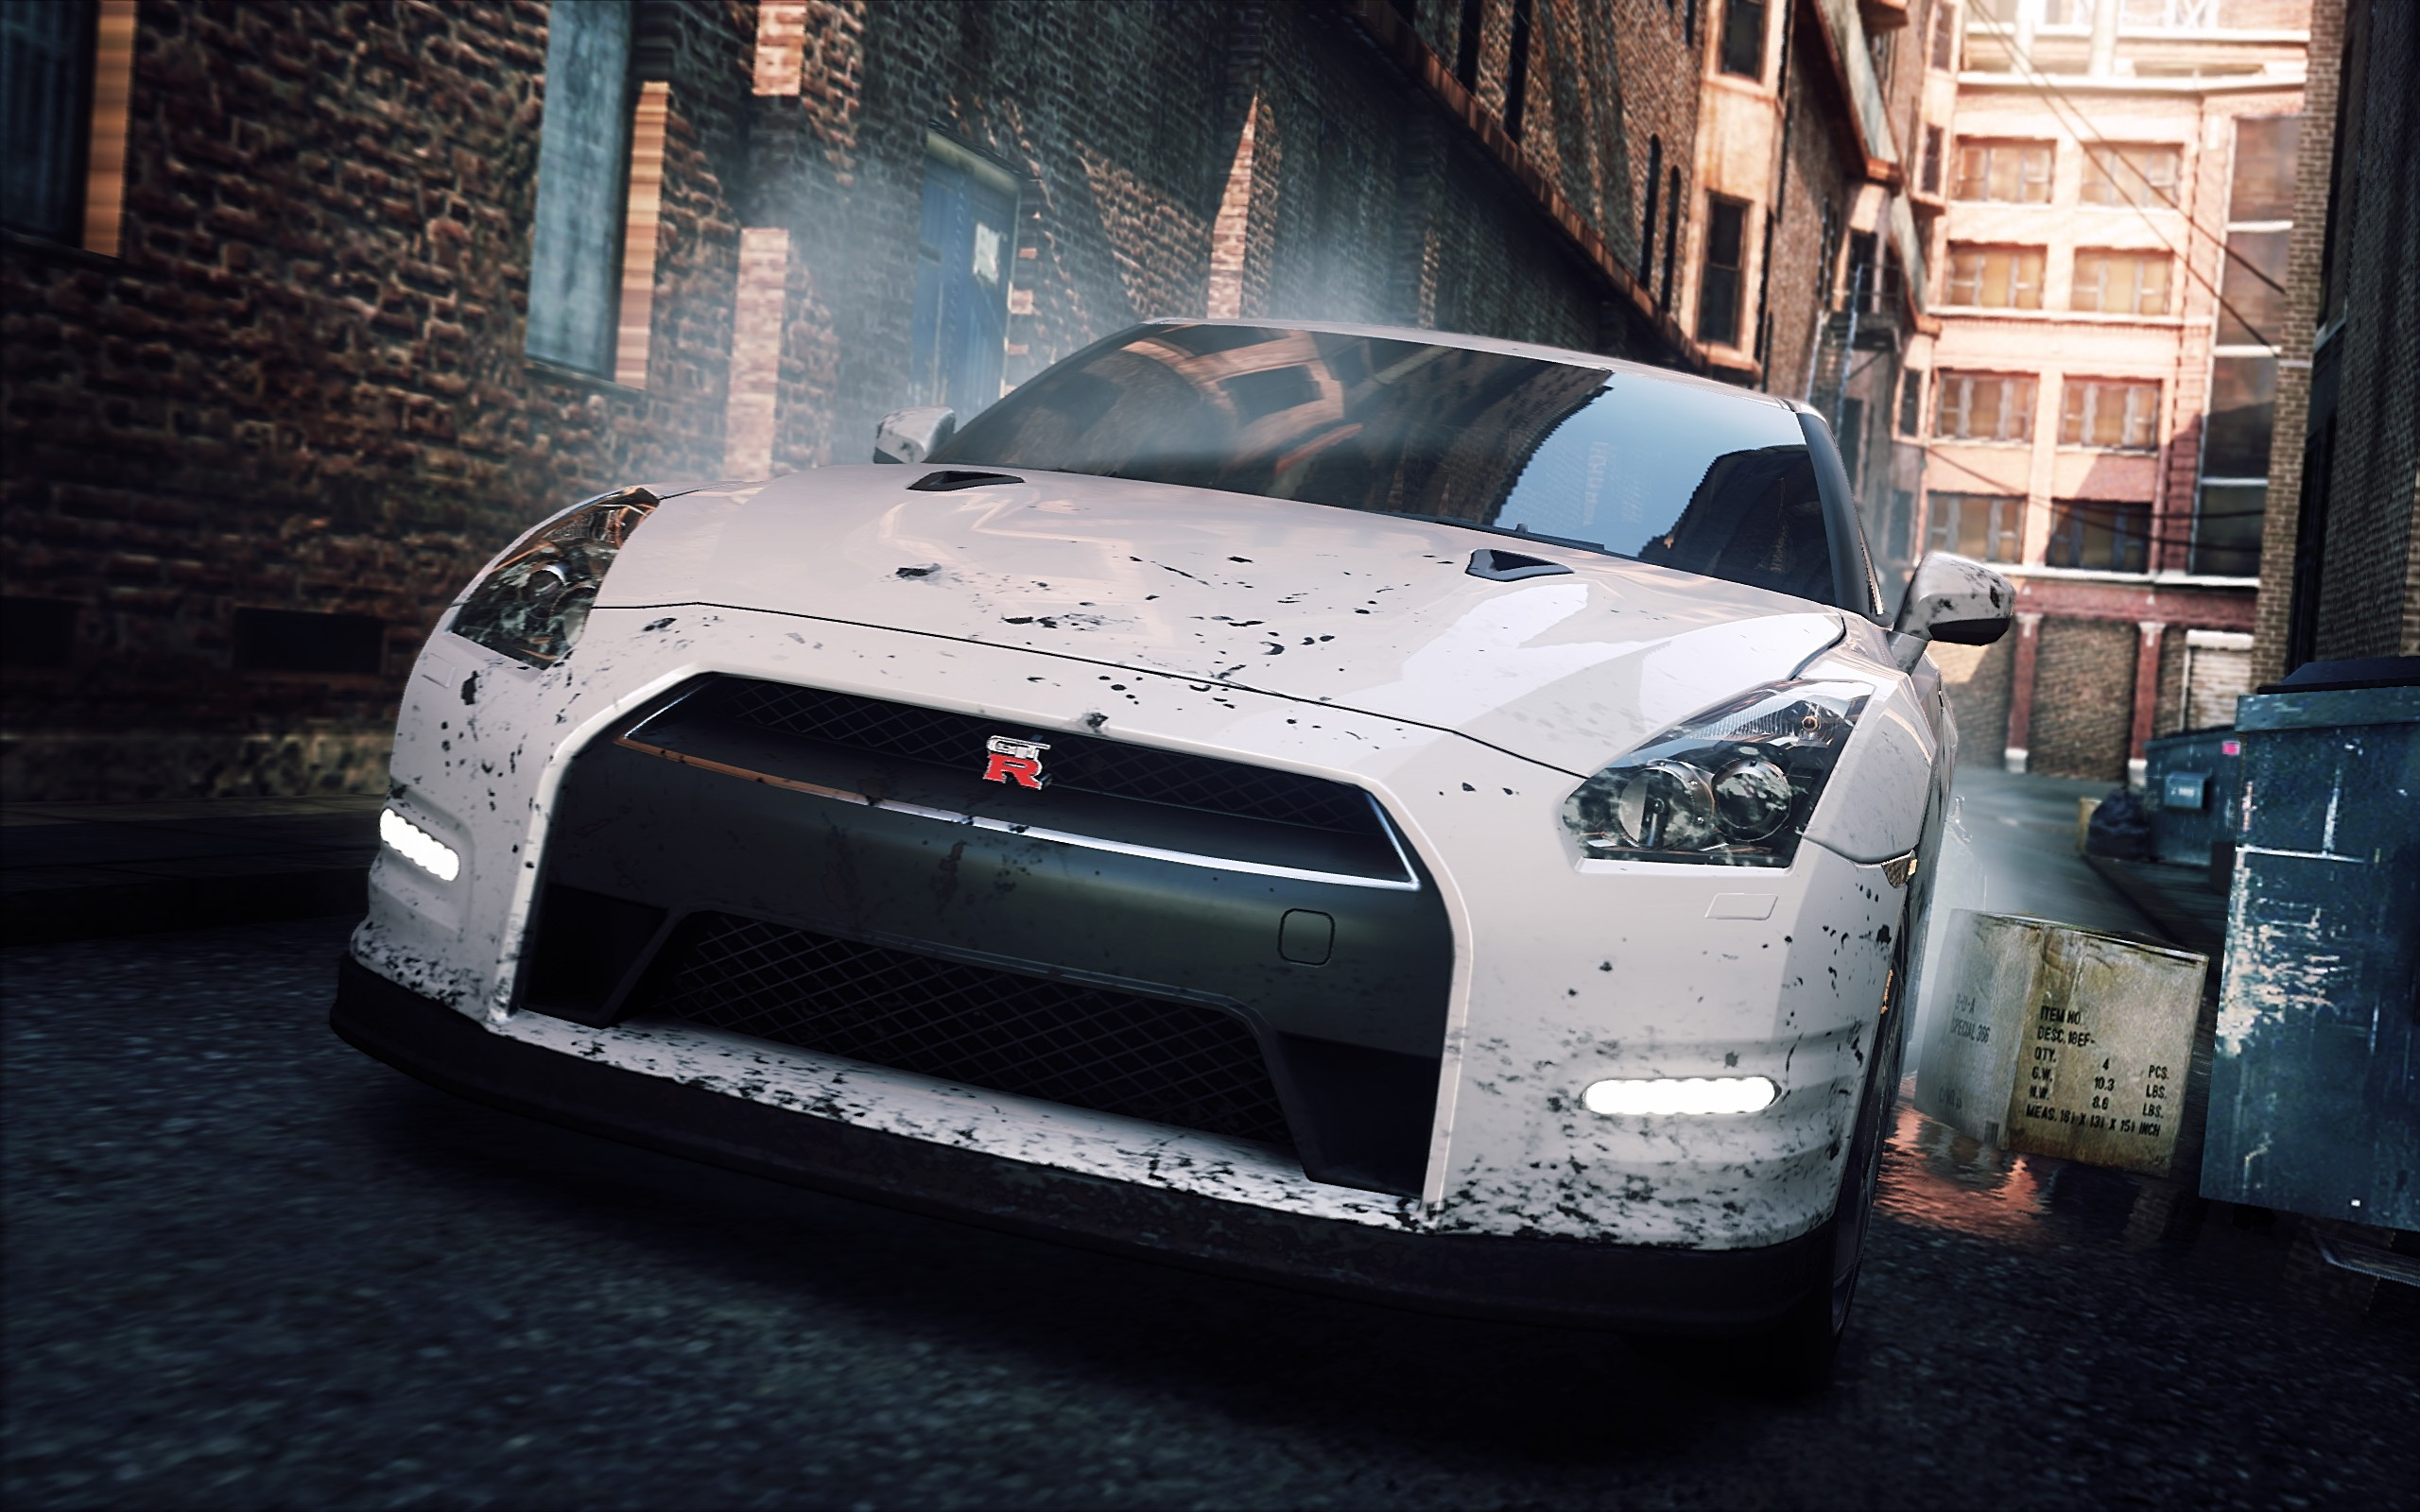 Wallpaper 4k Nissan Gtr Need For Speed 4k Cars Wallpapers Games